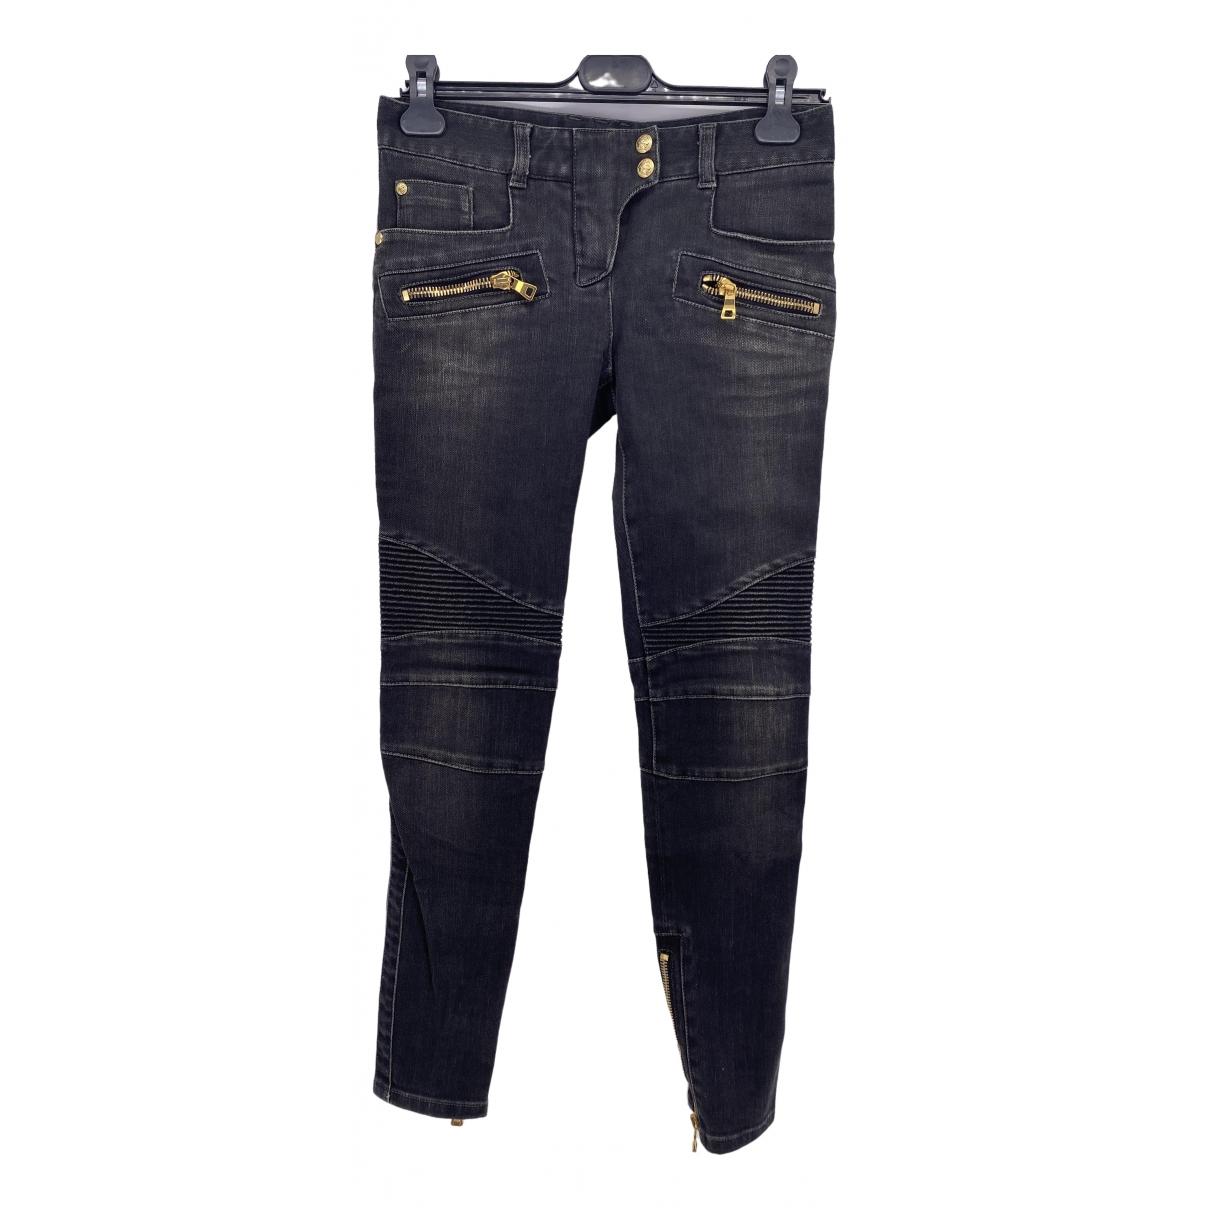 Balmain \N Black Cotton Jeans for Women 25 US